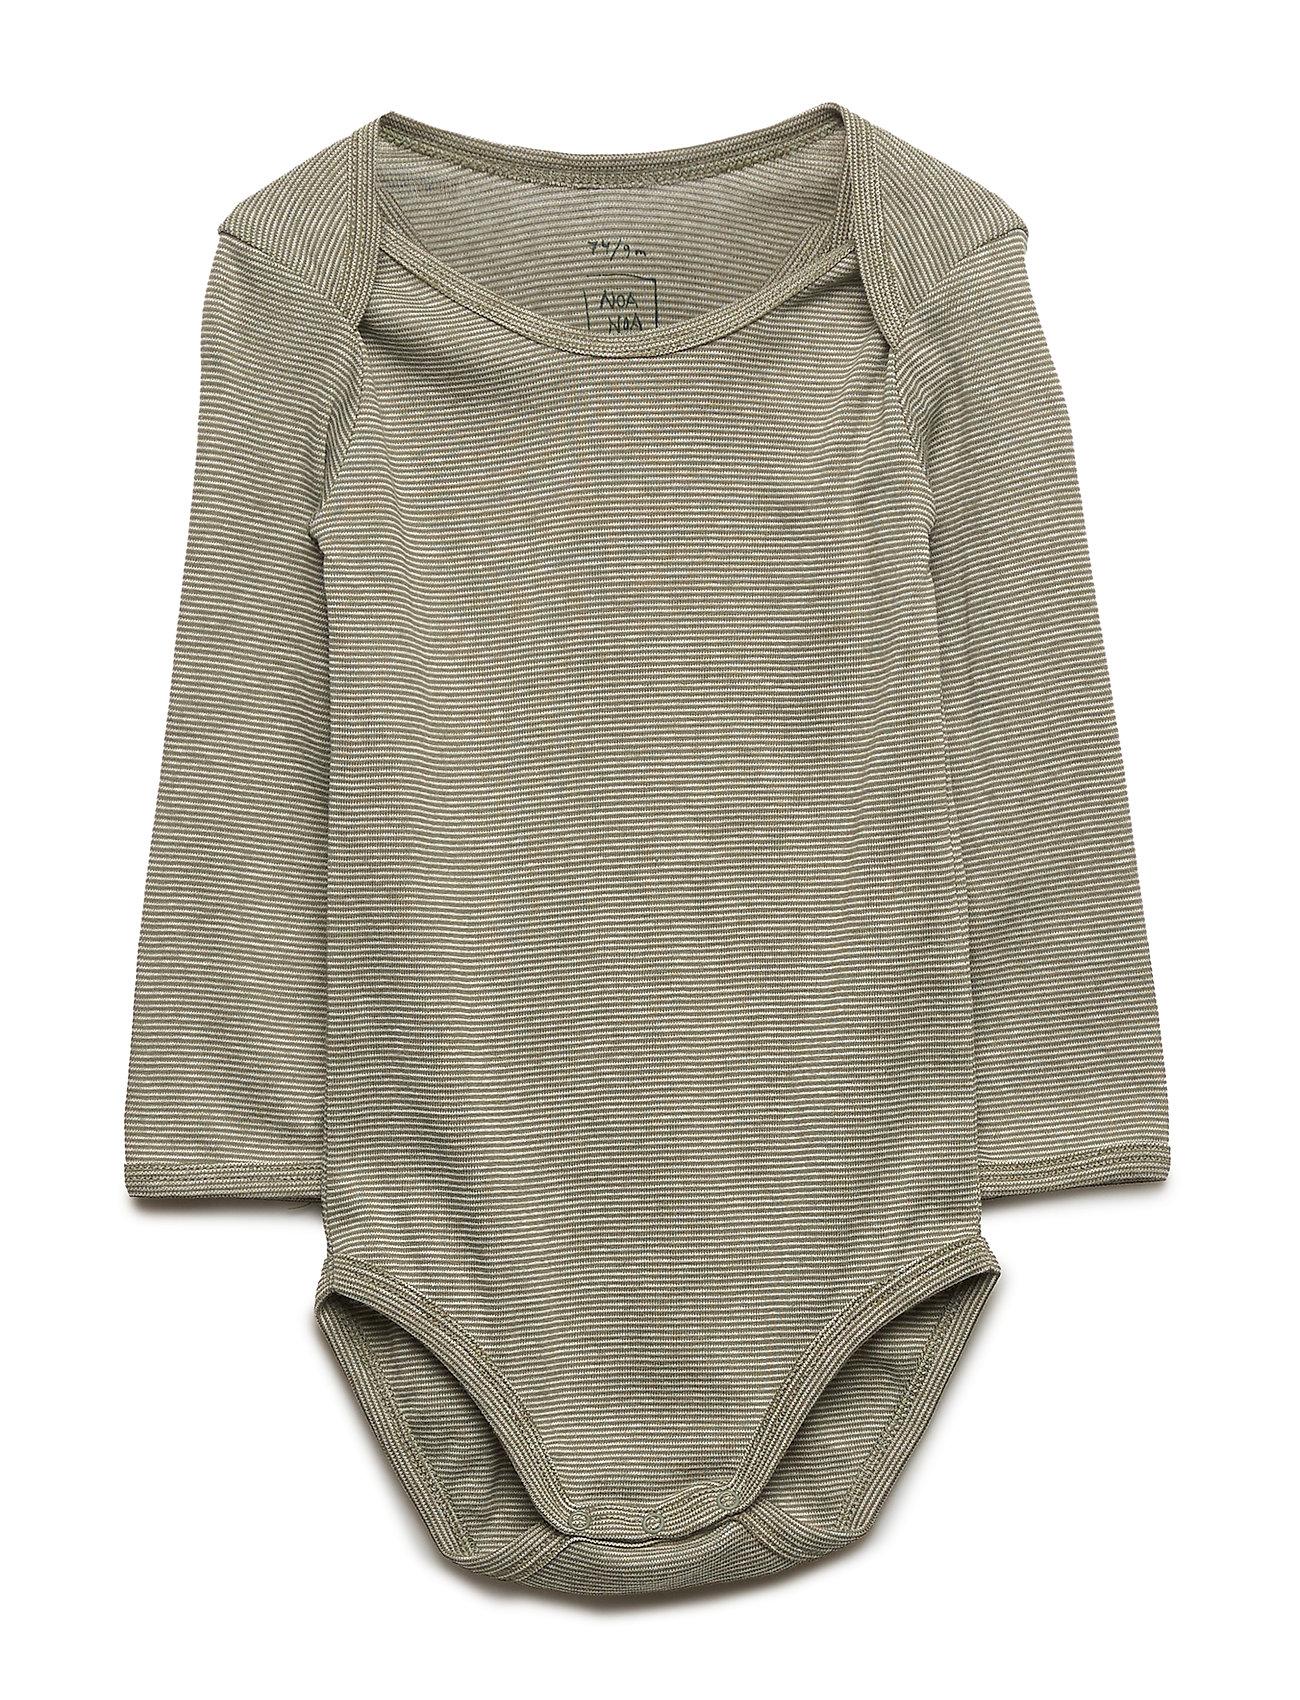 Noa Noa Miniature Baby Body - DUSTY OLIVE